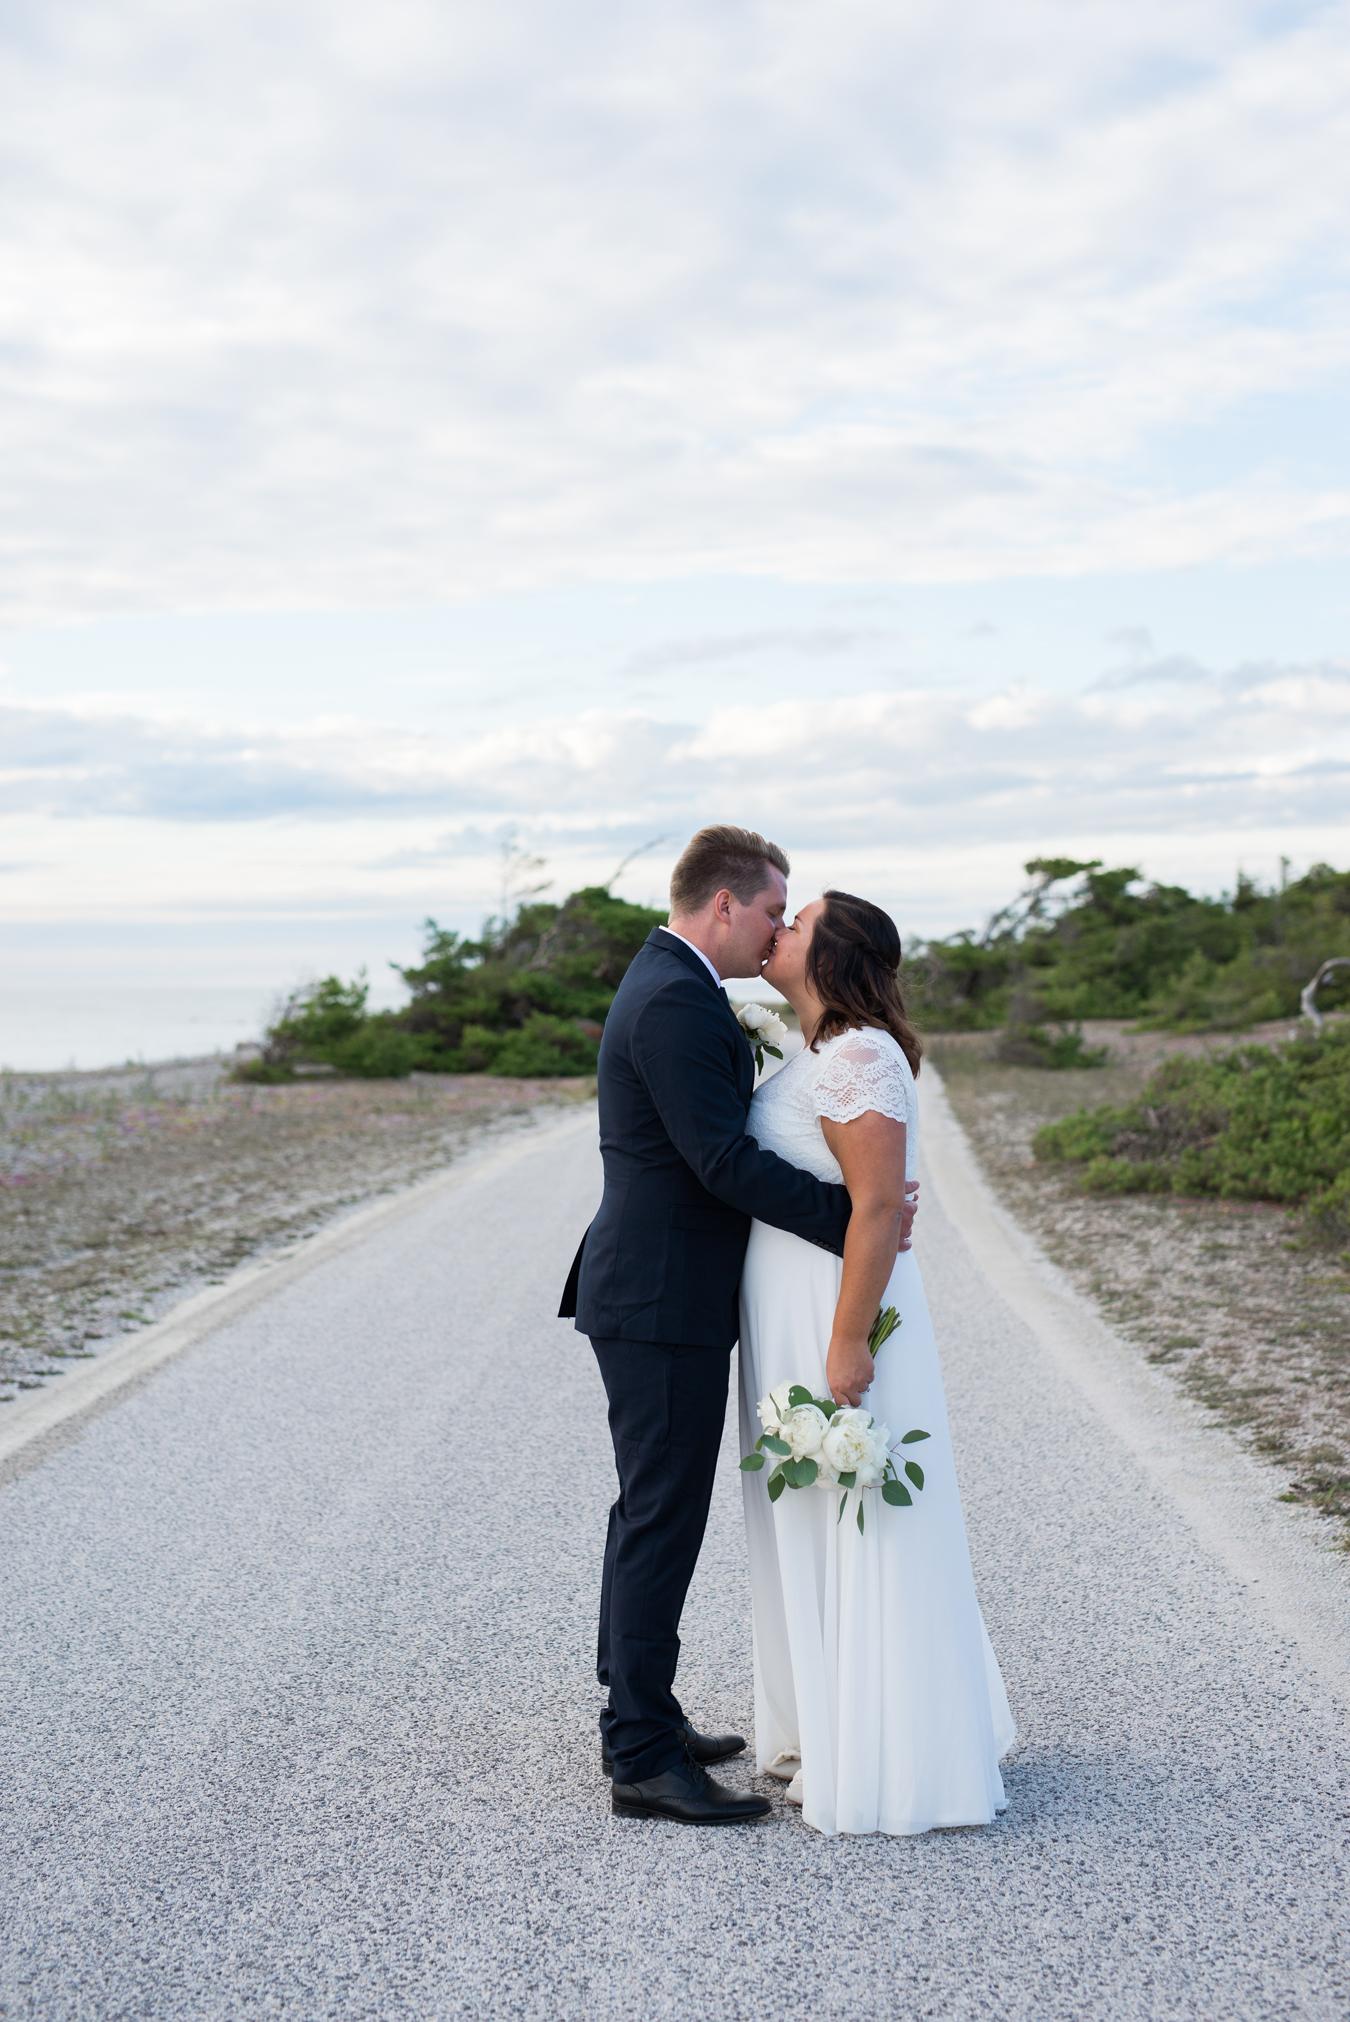 104-bröllopsfotograf-gotland-ekstakusten-neas-fotografi.jpg